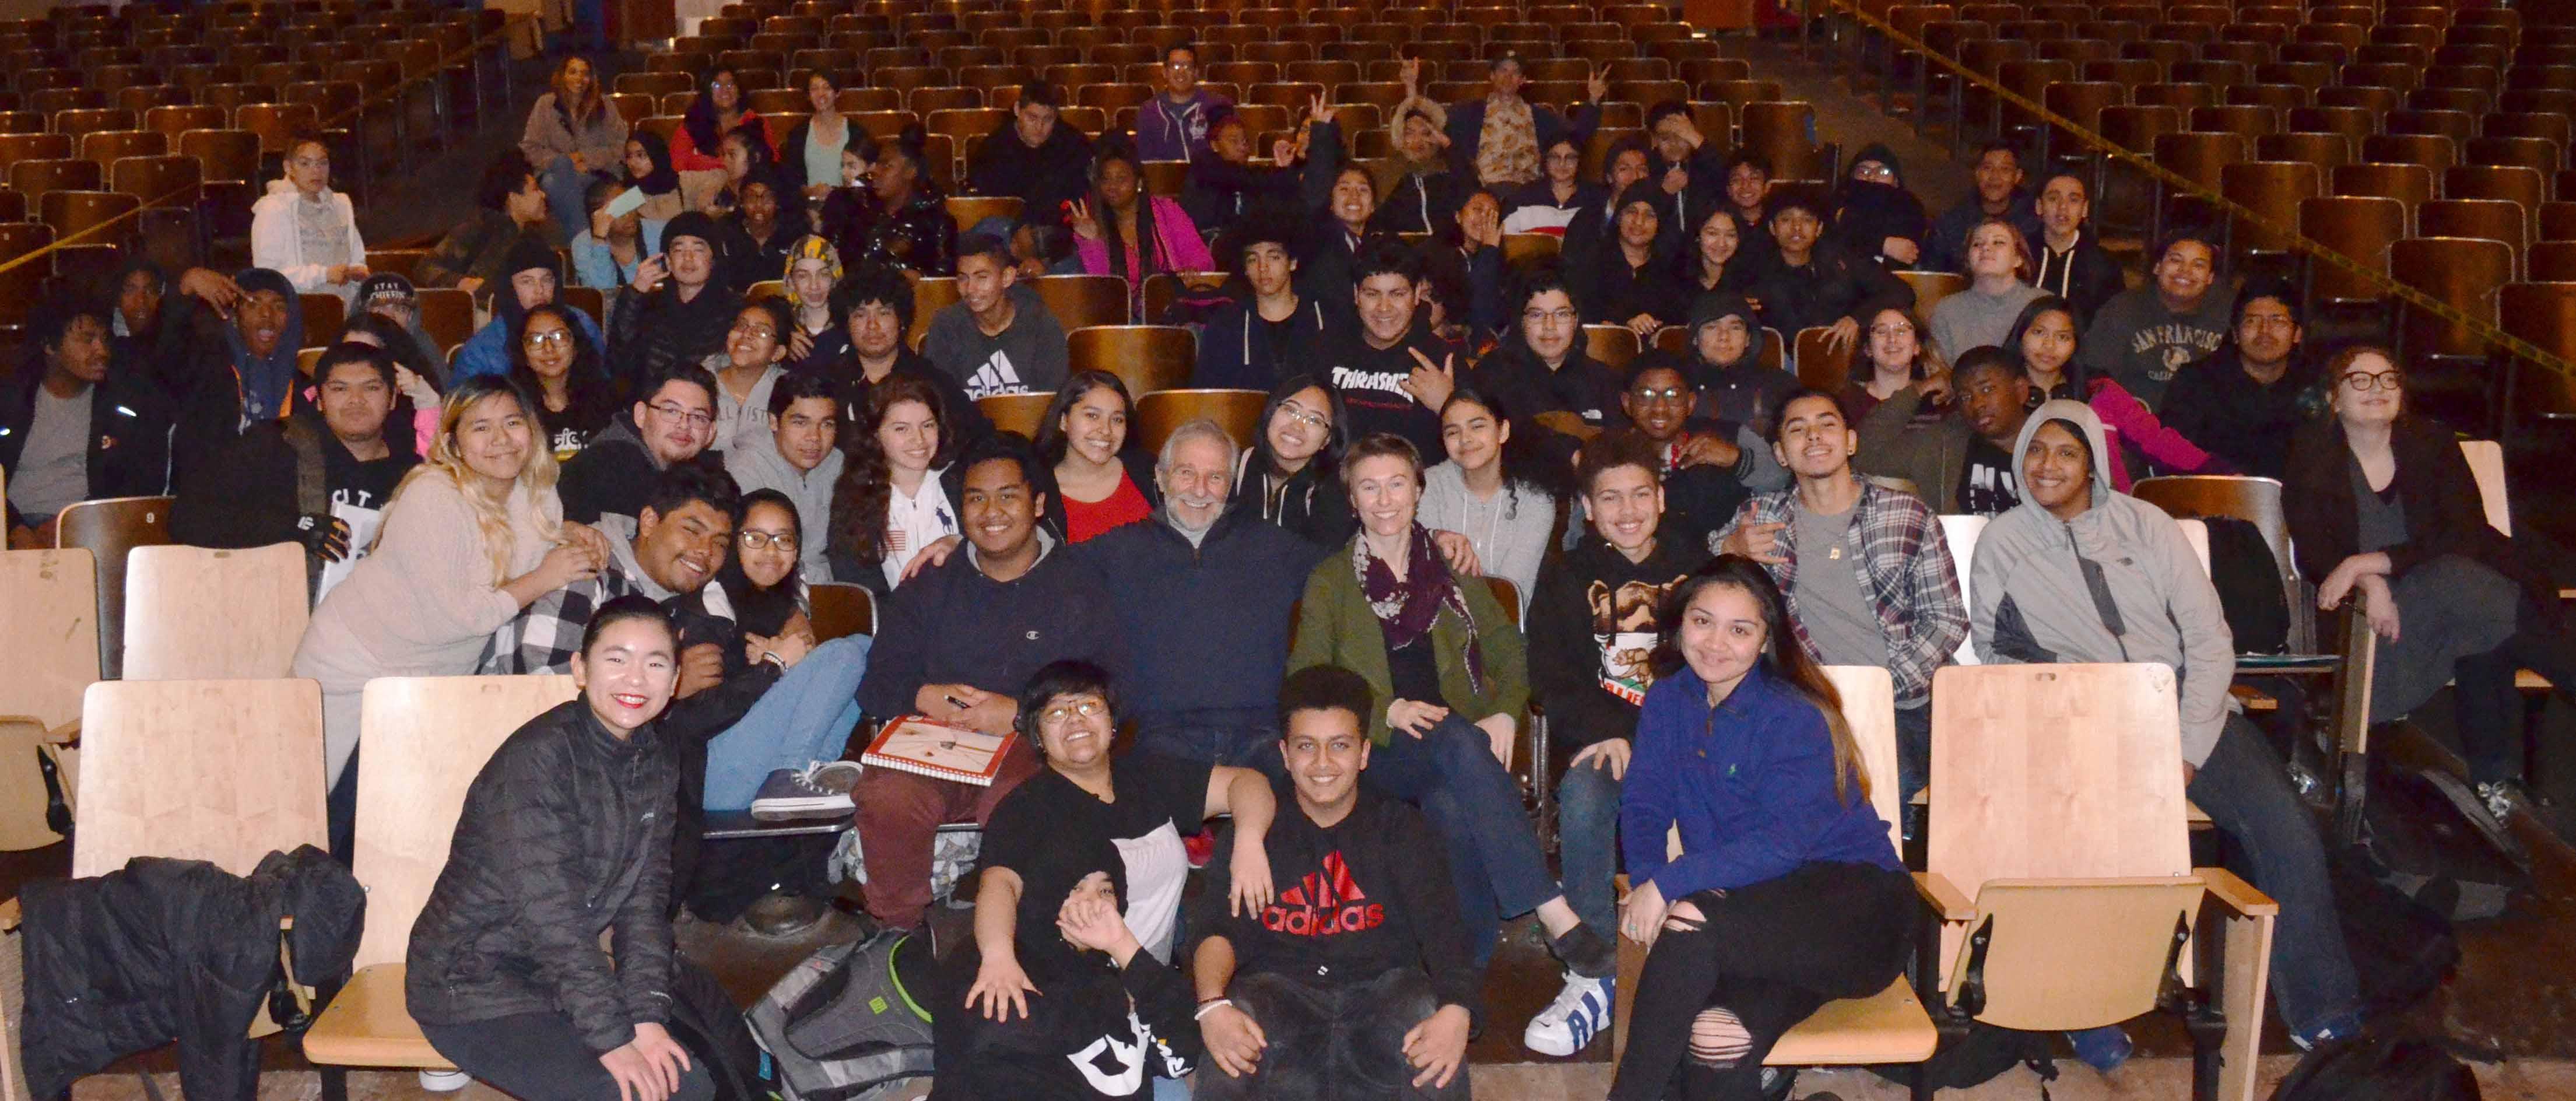 City Arts and Tech High School, San Francisco, CA – March 22